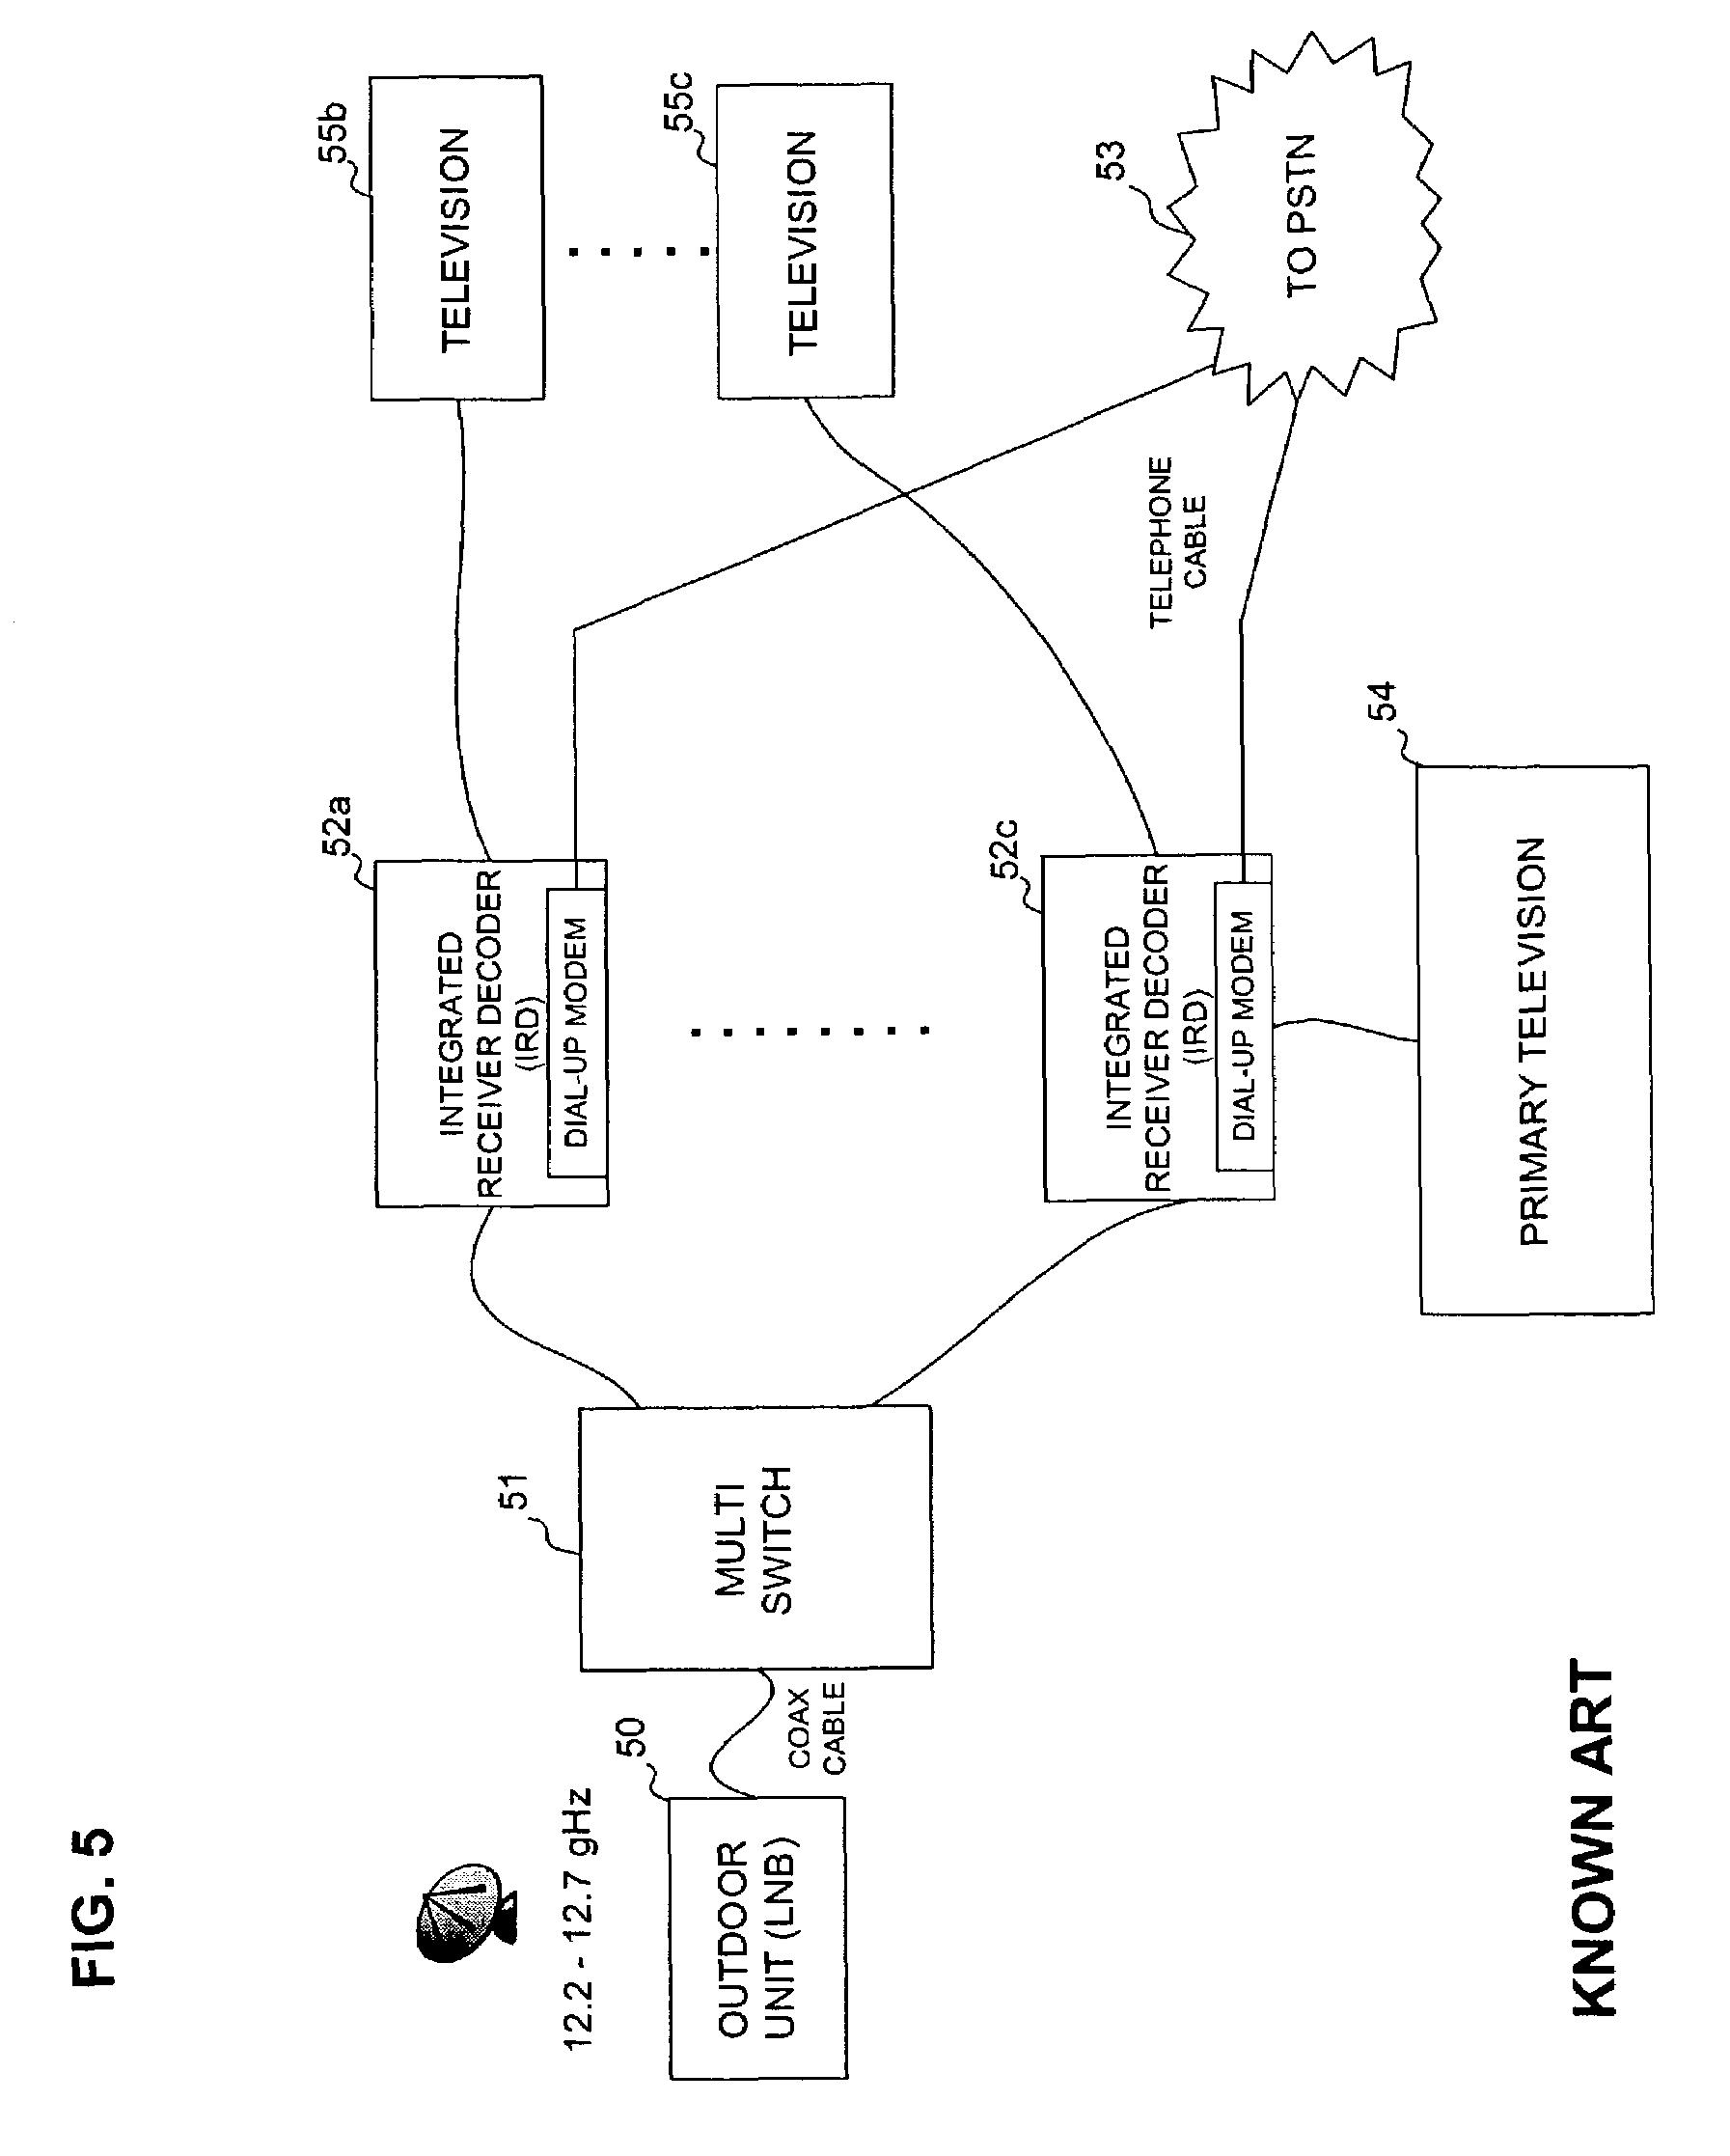 dish network vip 222k wiring diagram for dish vip 722 receiver wiring diagram